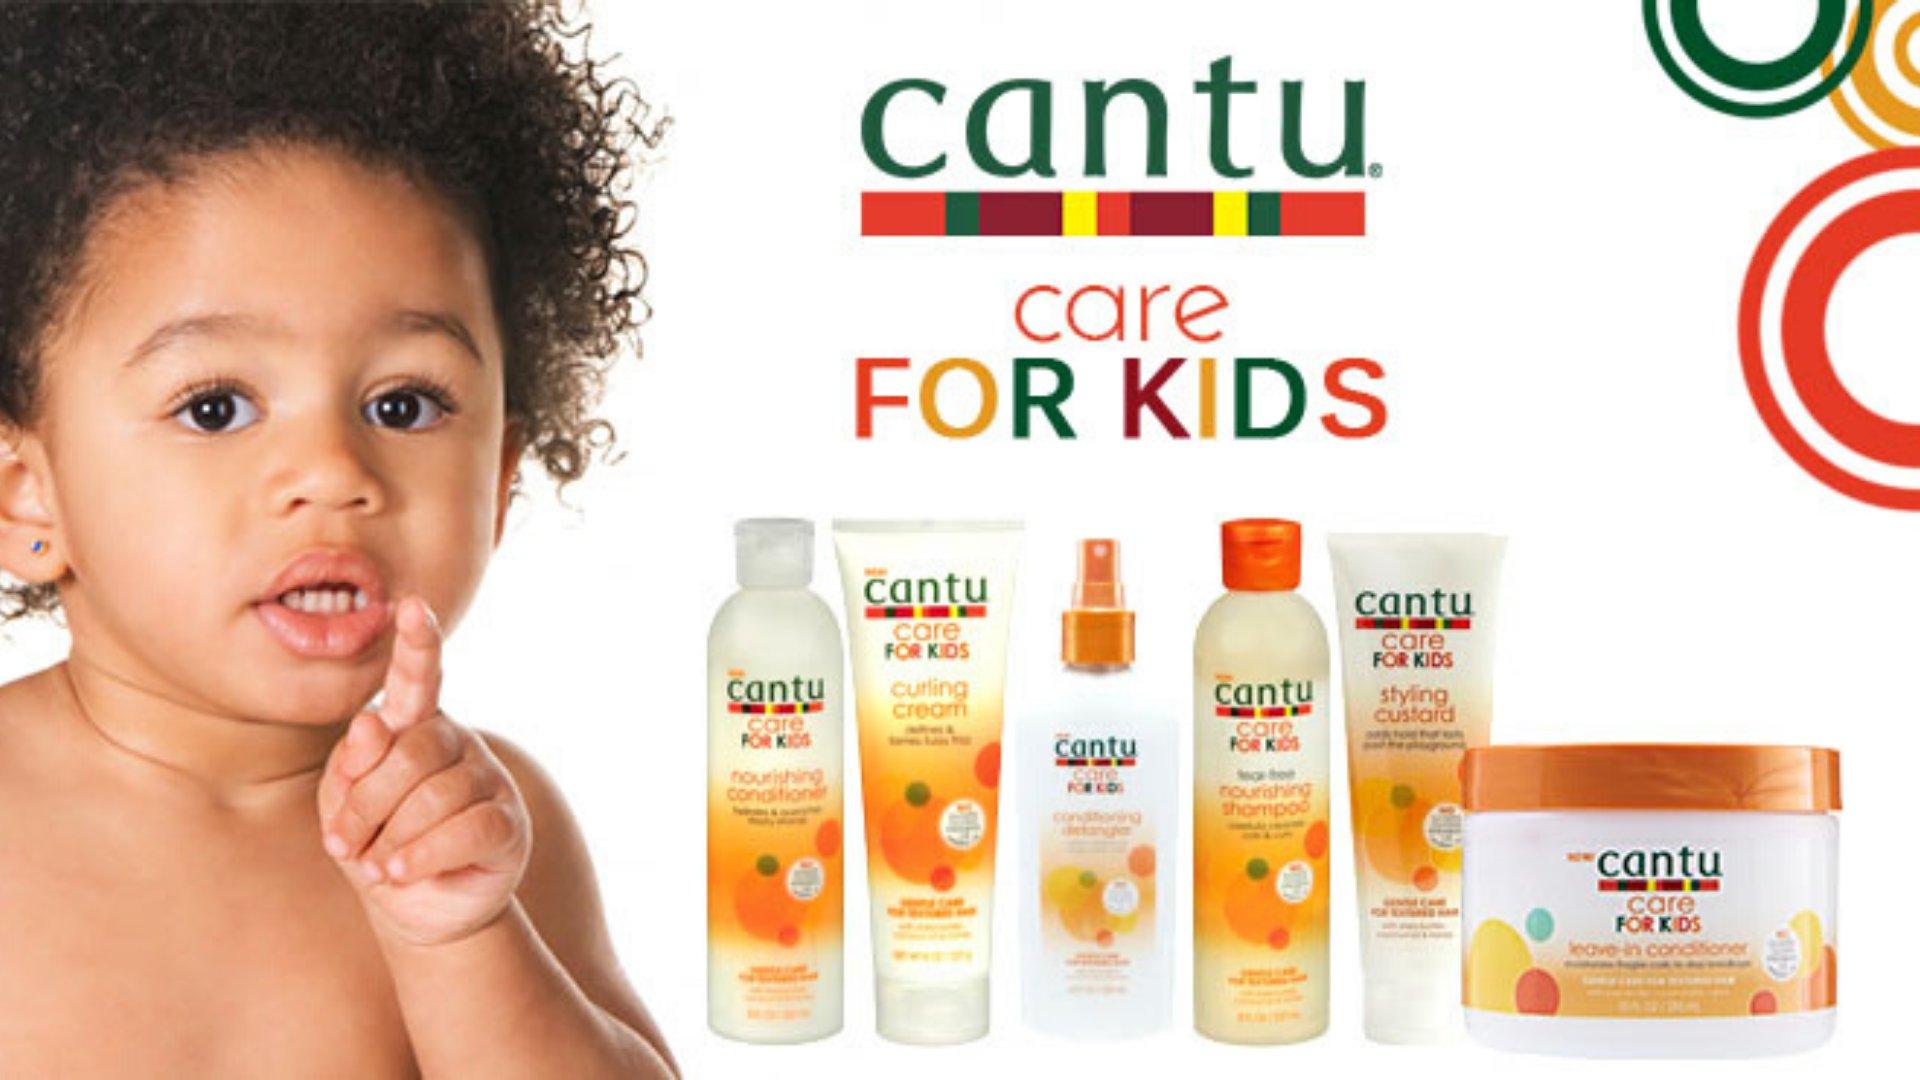 fiche produit ebcosmetique cantu shea butter care for kids leave-in conditioner